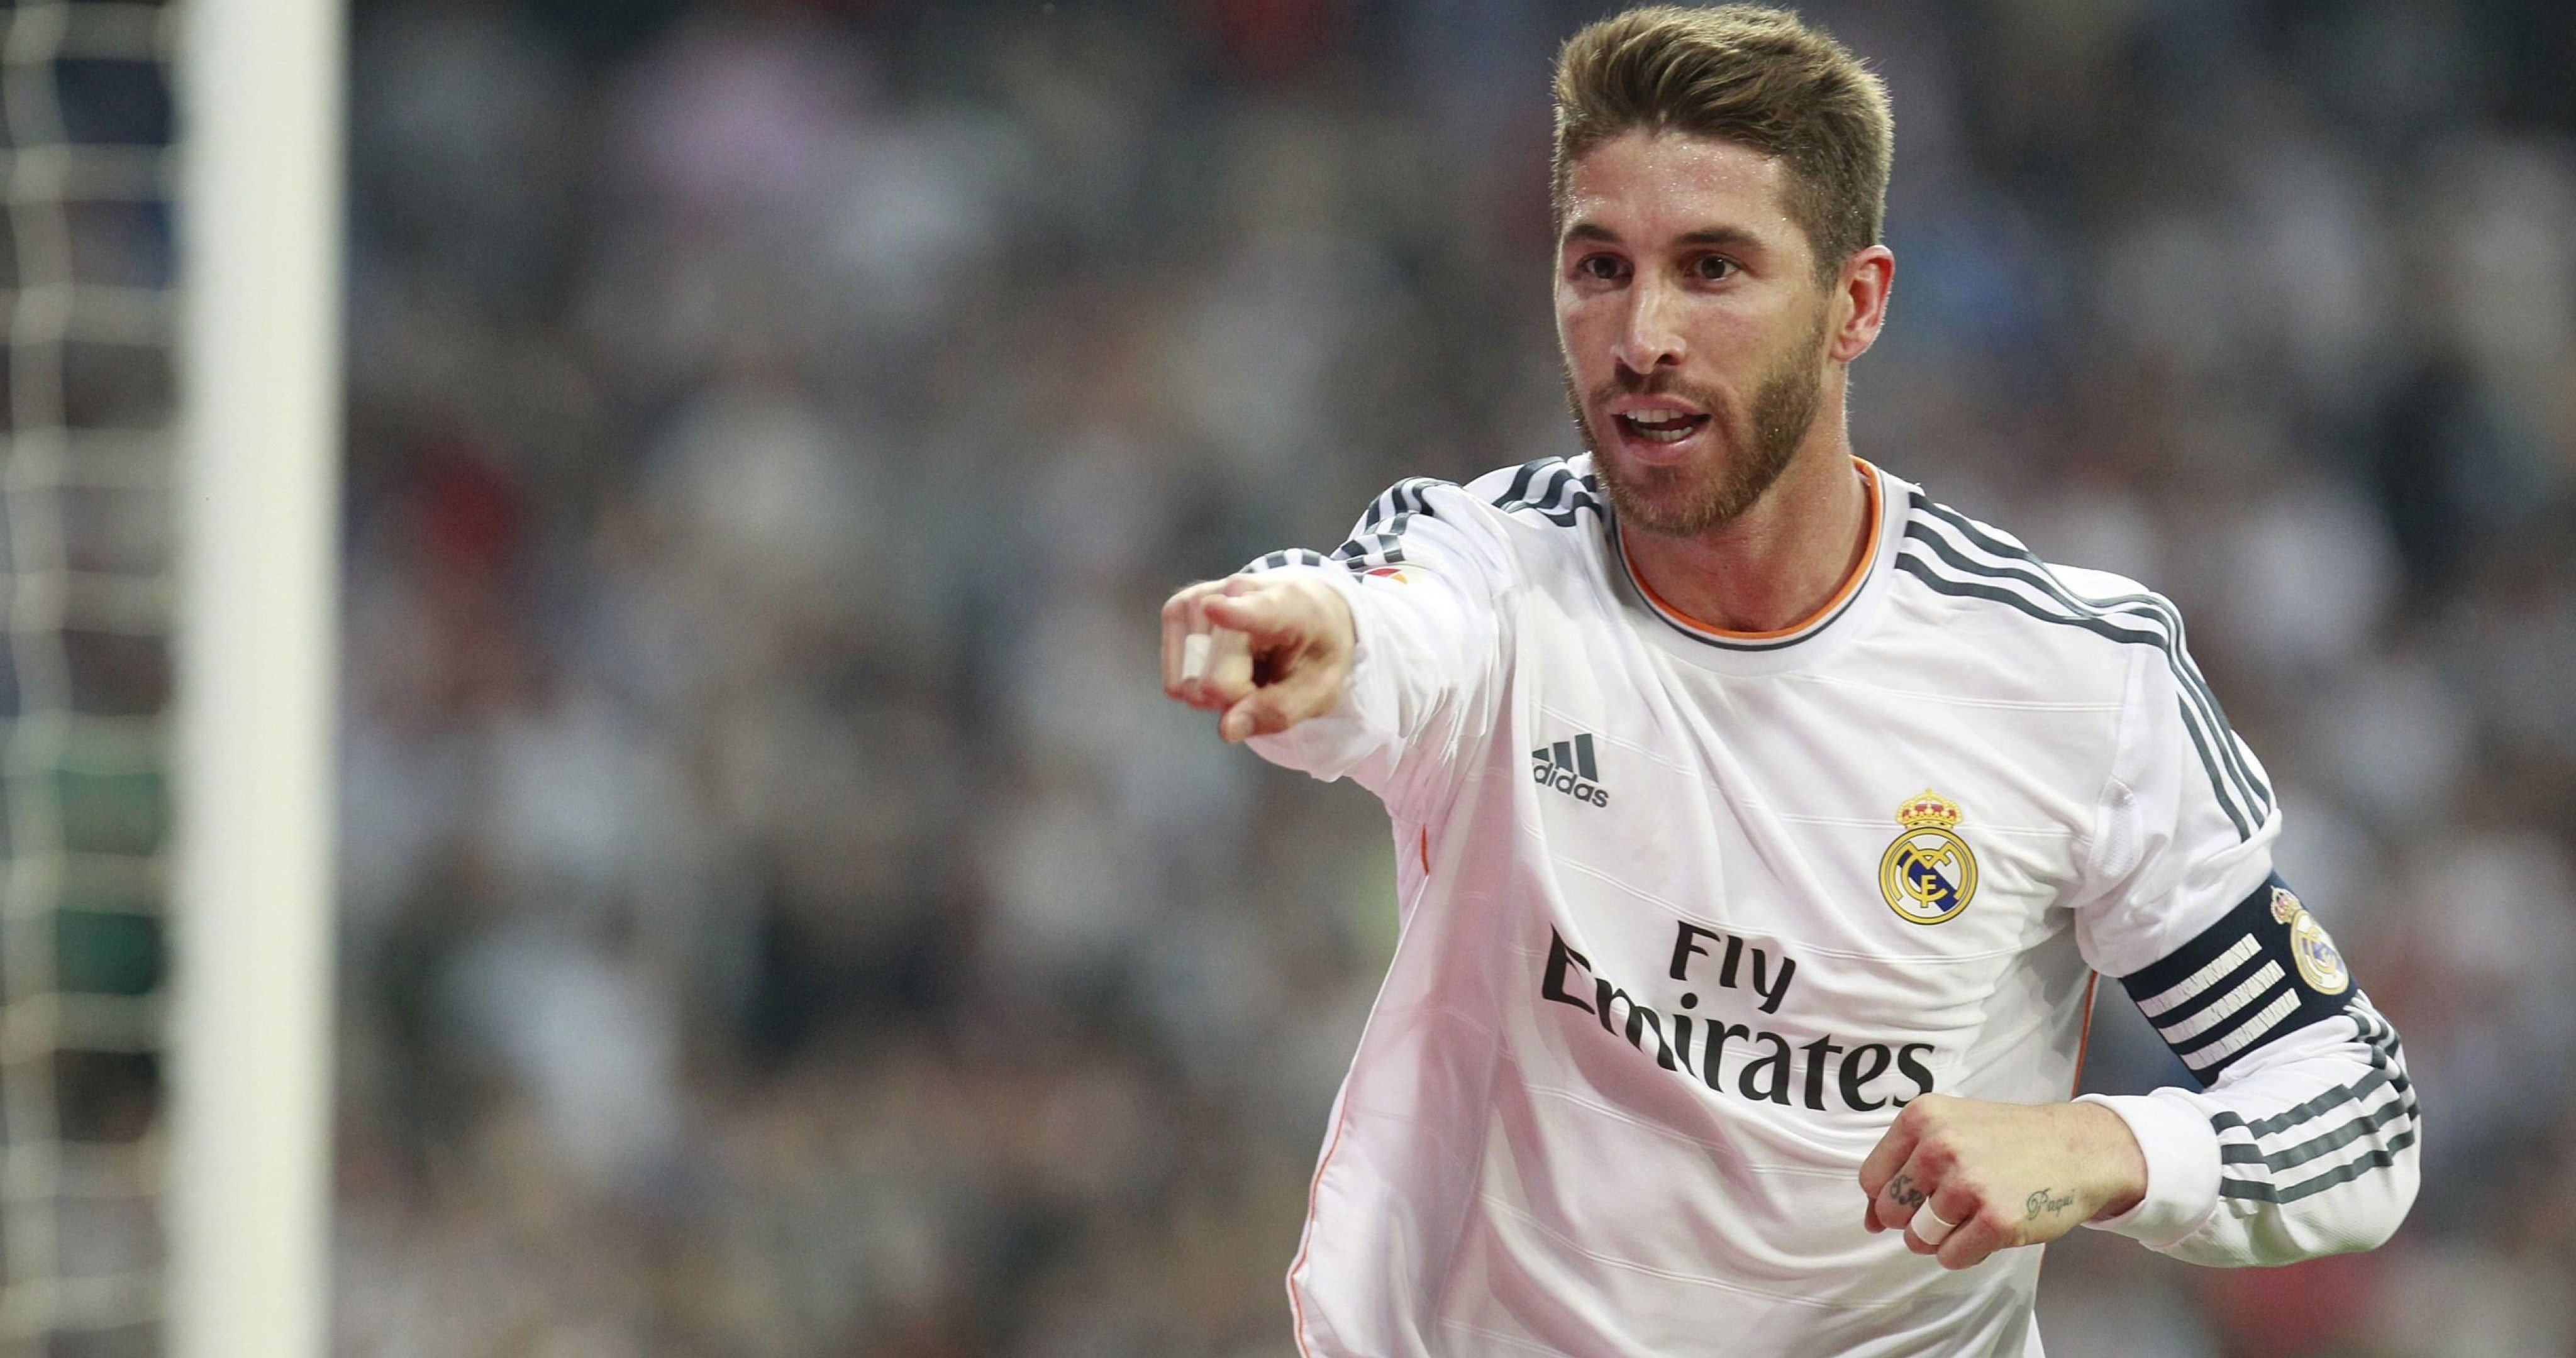 Sergio Ramos Real Madrid 4k Ultra Hd Wallpaper Sergio Ramos Madrid Wallpaper Real Madrid Wallpapers